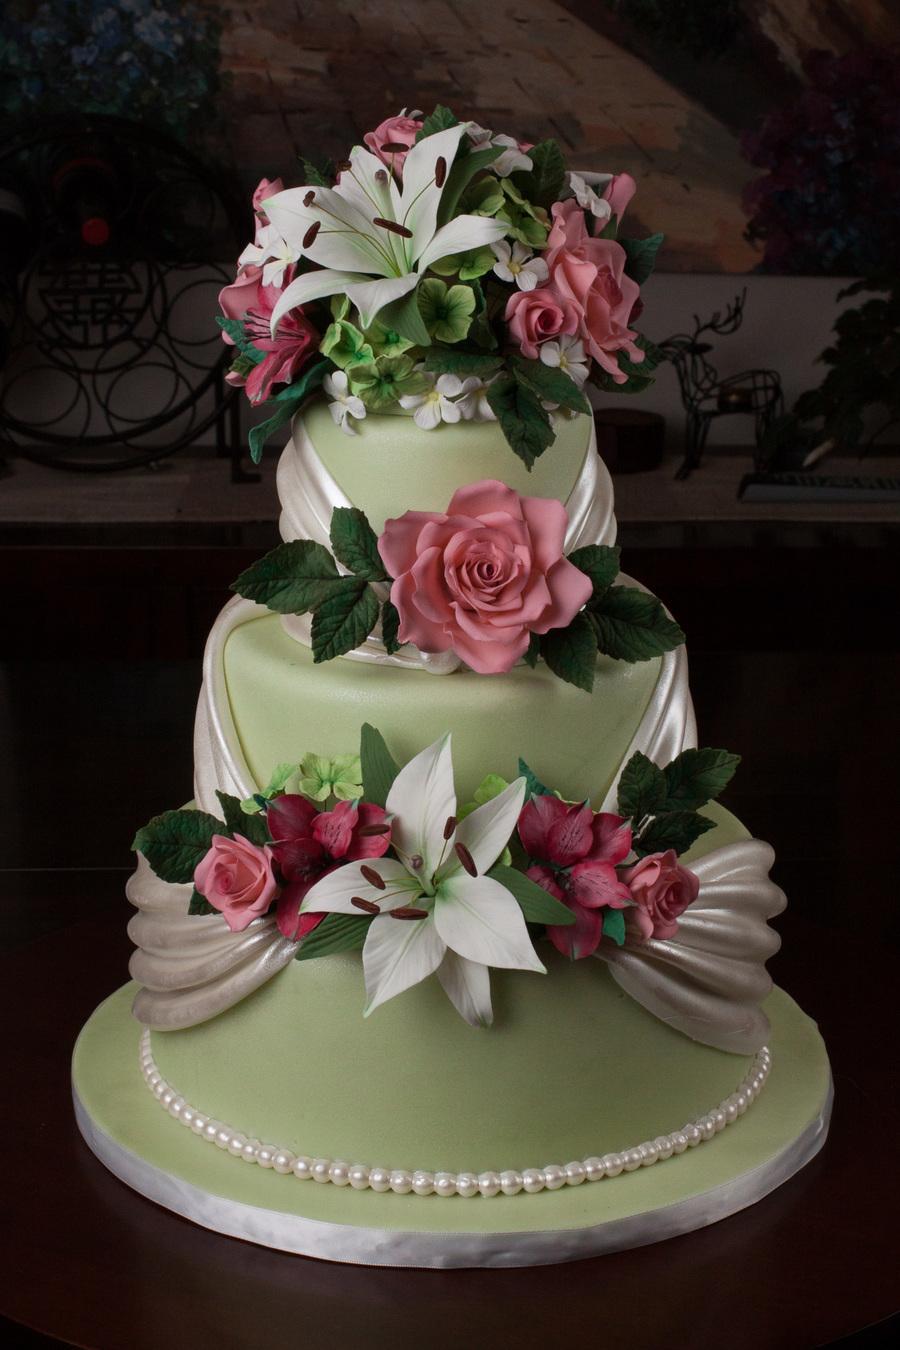 Professional Cake Decorating